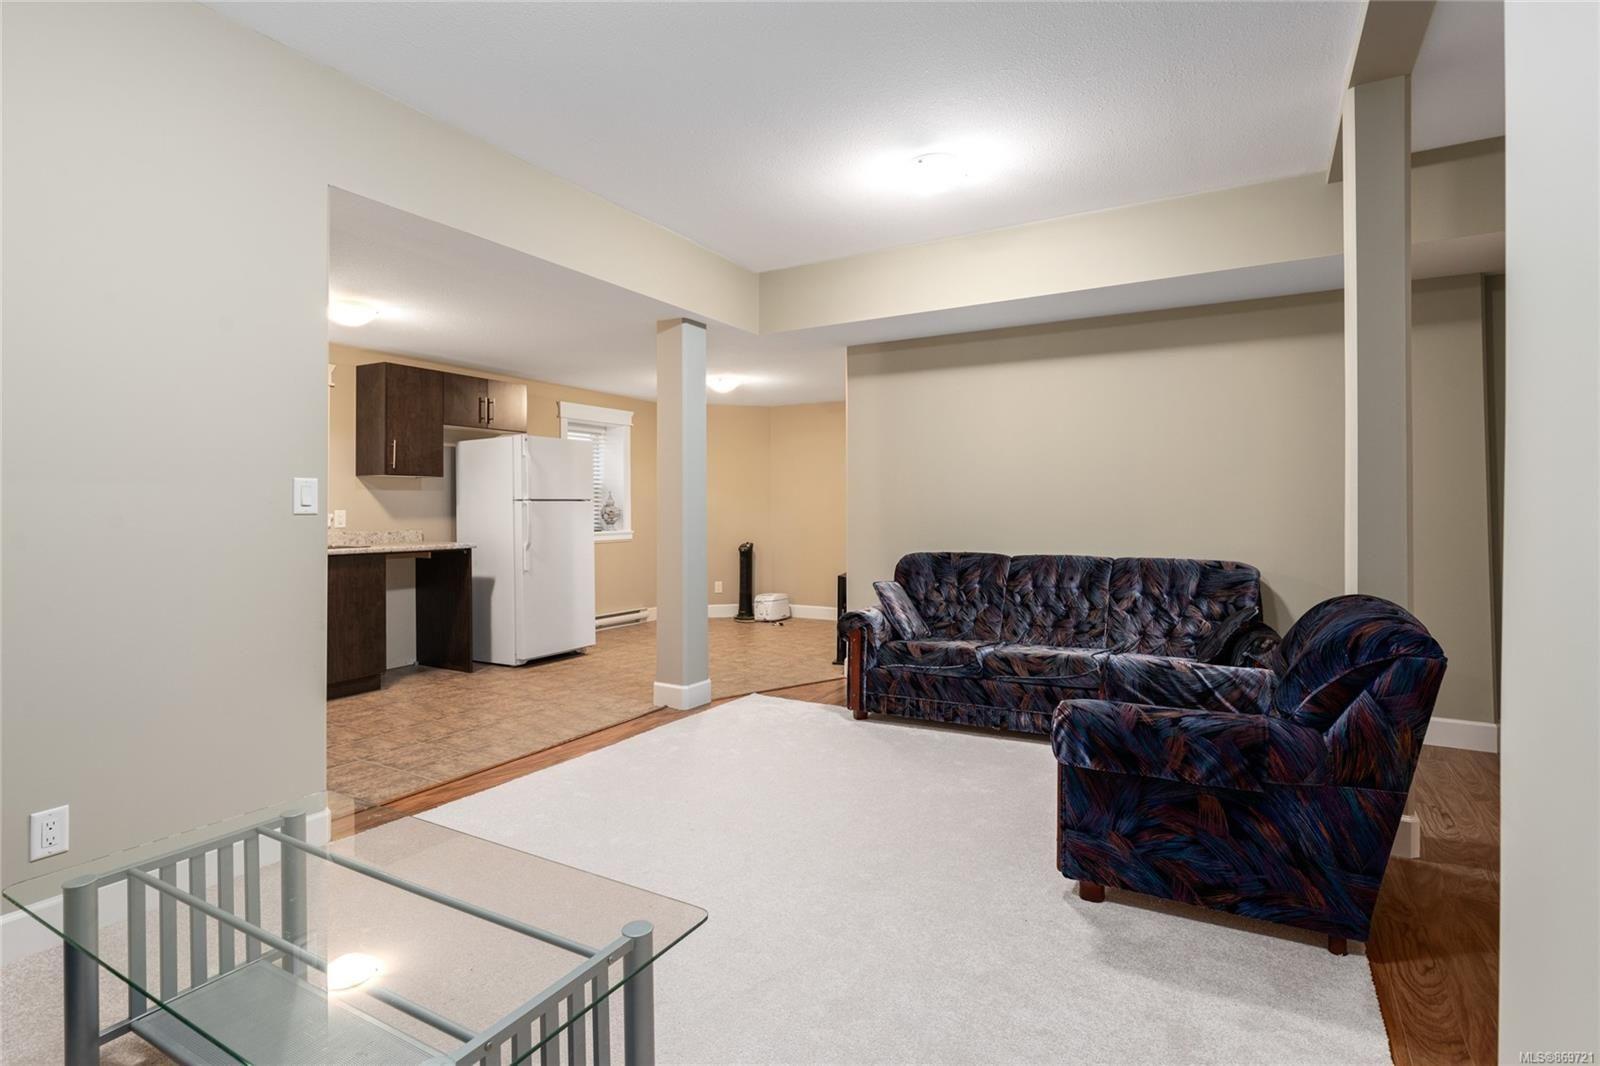 Photo 26: Photos: 2259 Leighton Rd in : Na South Jingle Pot House for sale (Nanaimo)  : MLS®# 869721